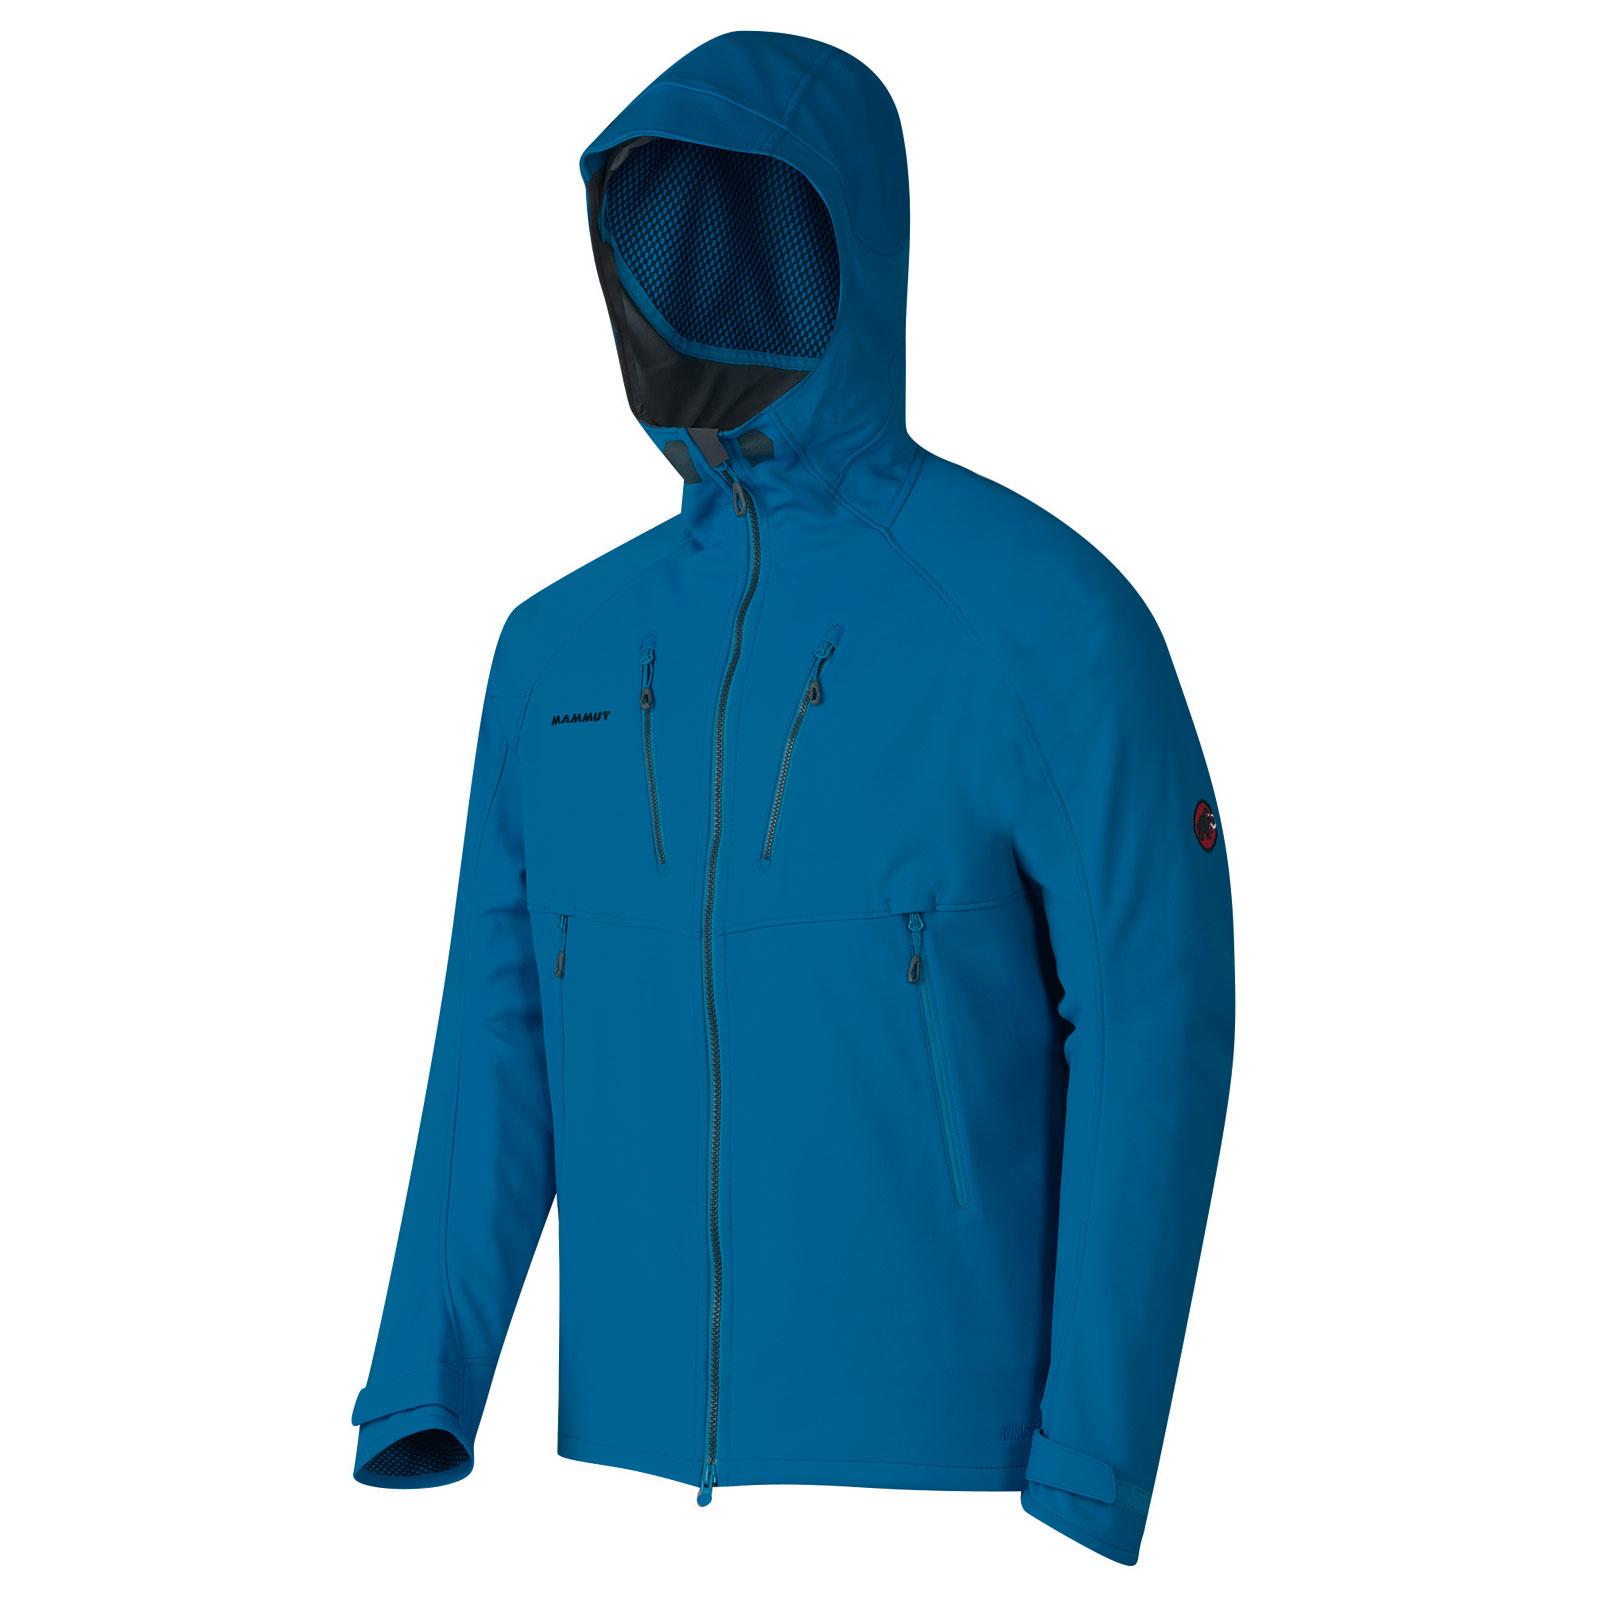 new style 3876e b3d92 Mammut Herren Skitourenjacke Ultimate Alpine Hoody hellblau